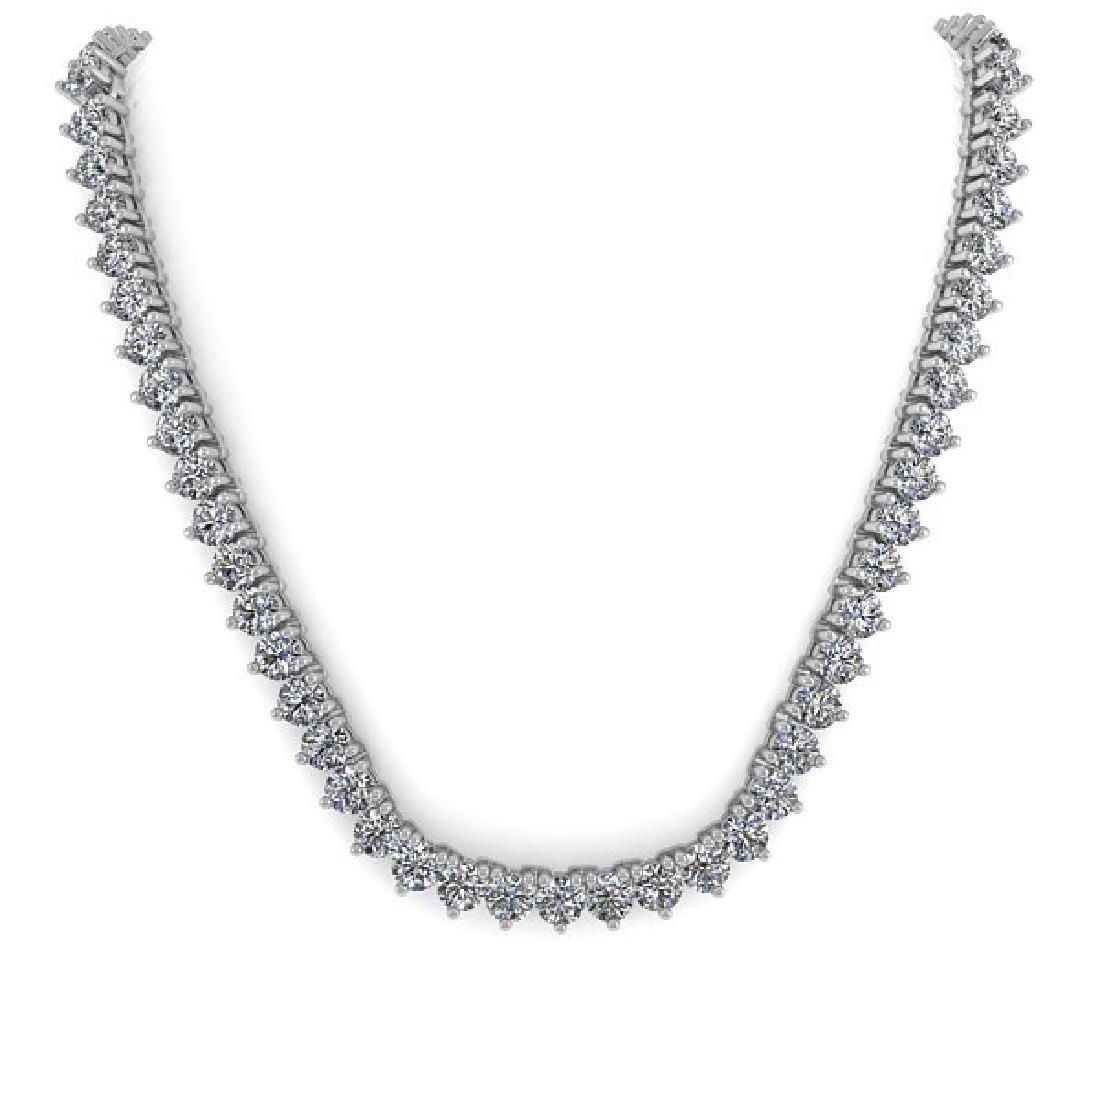 48 CTW Solitaire SI Diamond Necklace 18K White Gold - 3